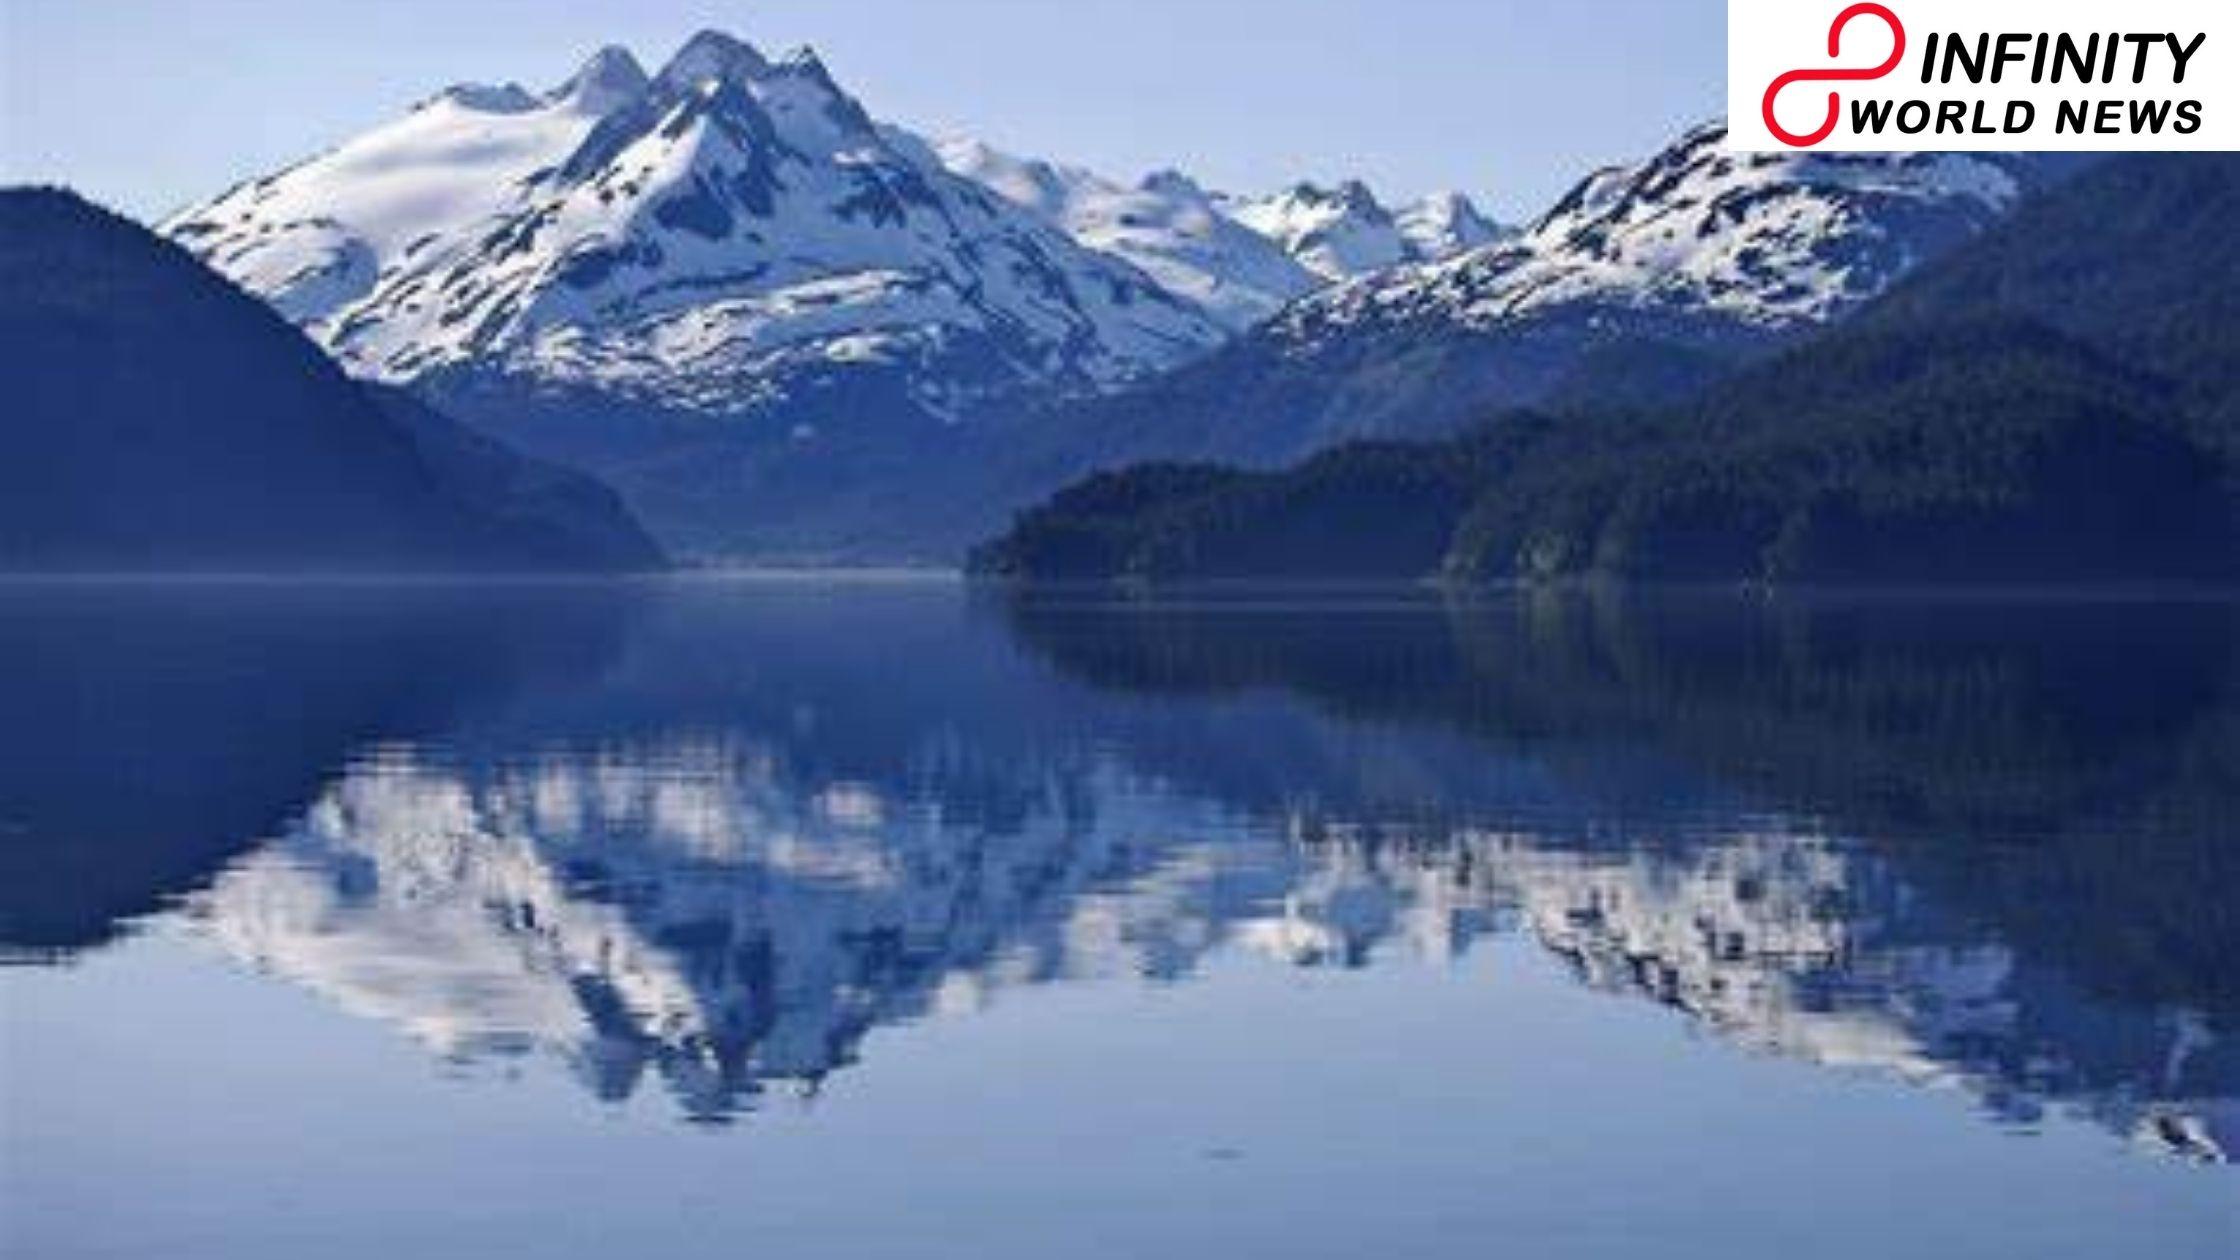 Environmental change: Alaskan wild opens up for oil investigation